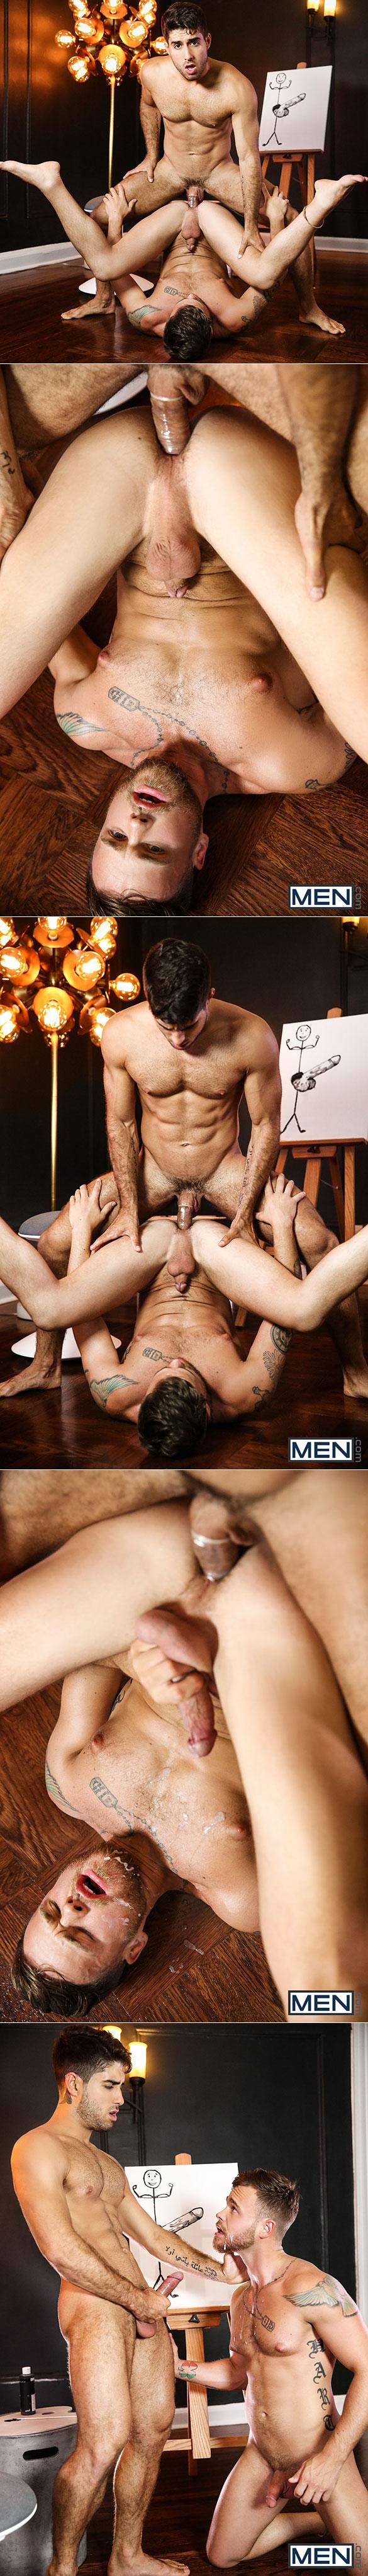 "Men.com: Diego Sans fucks Max Wilde in ""The Artist"""